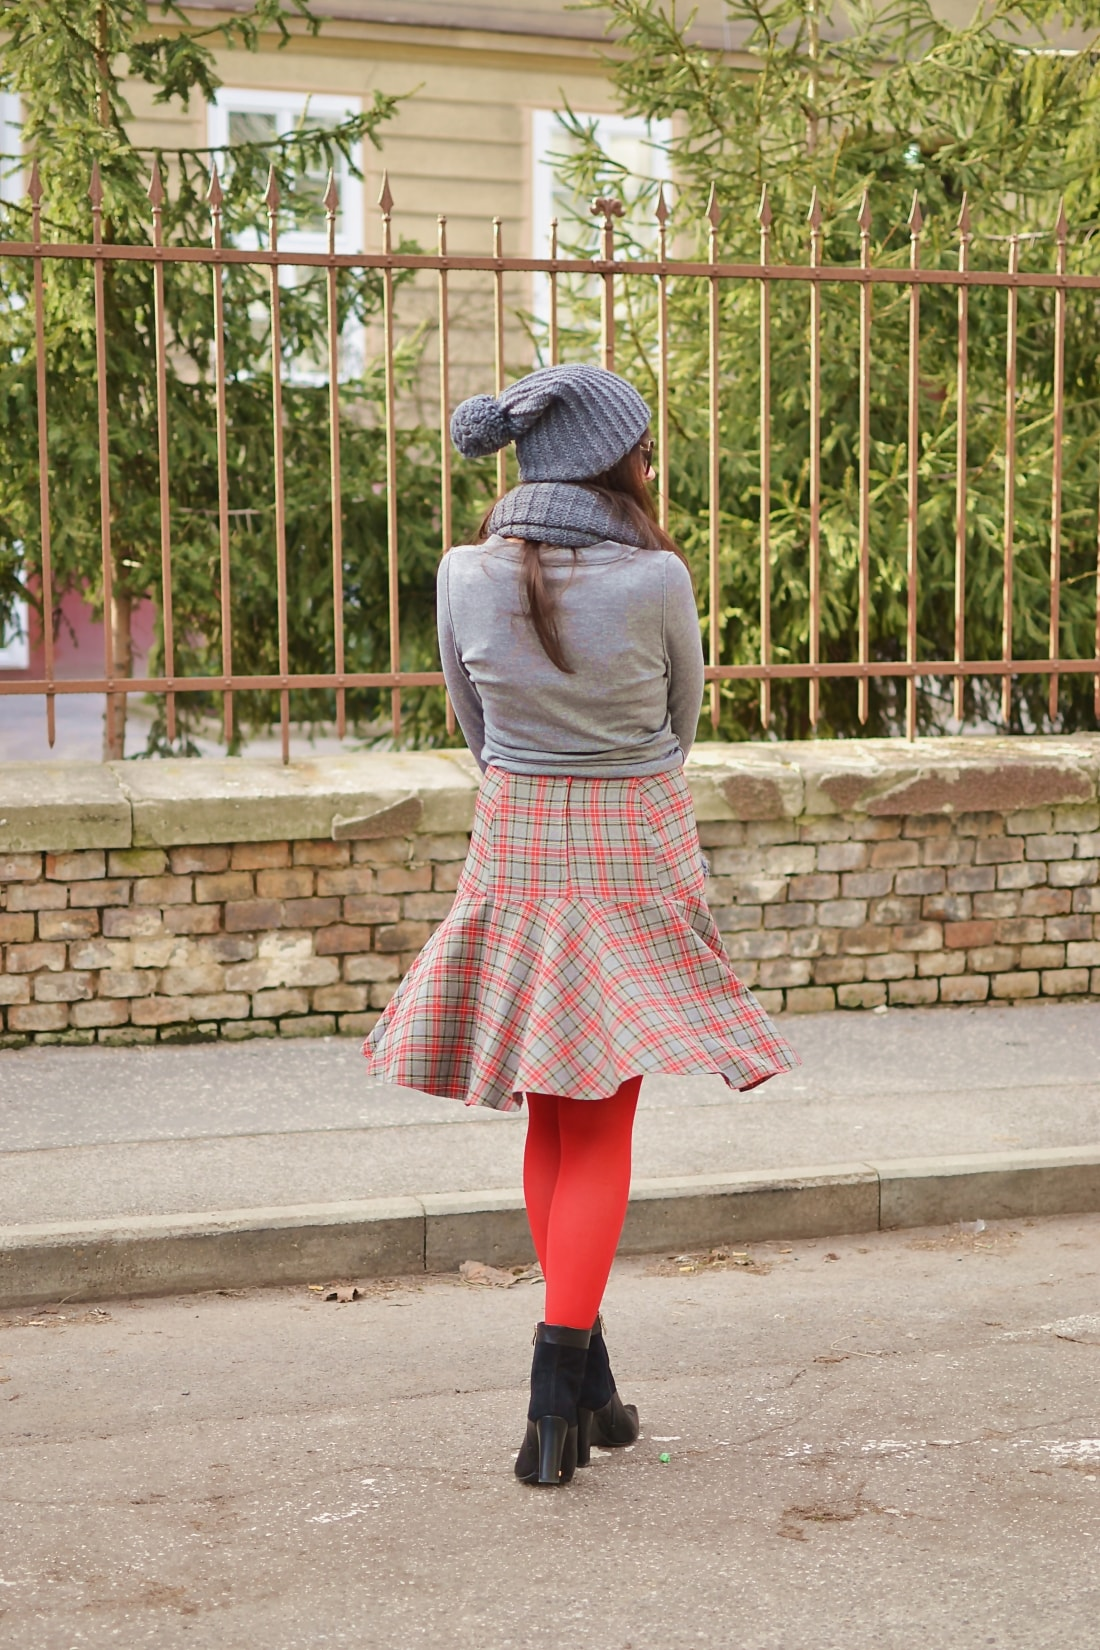 Červená_Katharine-fashion is beautiful_blog 9_Červené pančuchy_Červený kabát_Károvaná sukňa_Katarína Jakubčová_Fashion blogger_Outfit